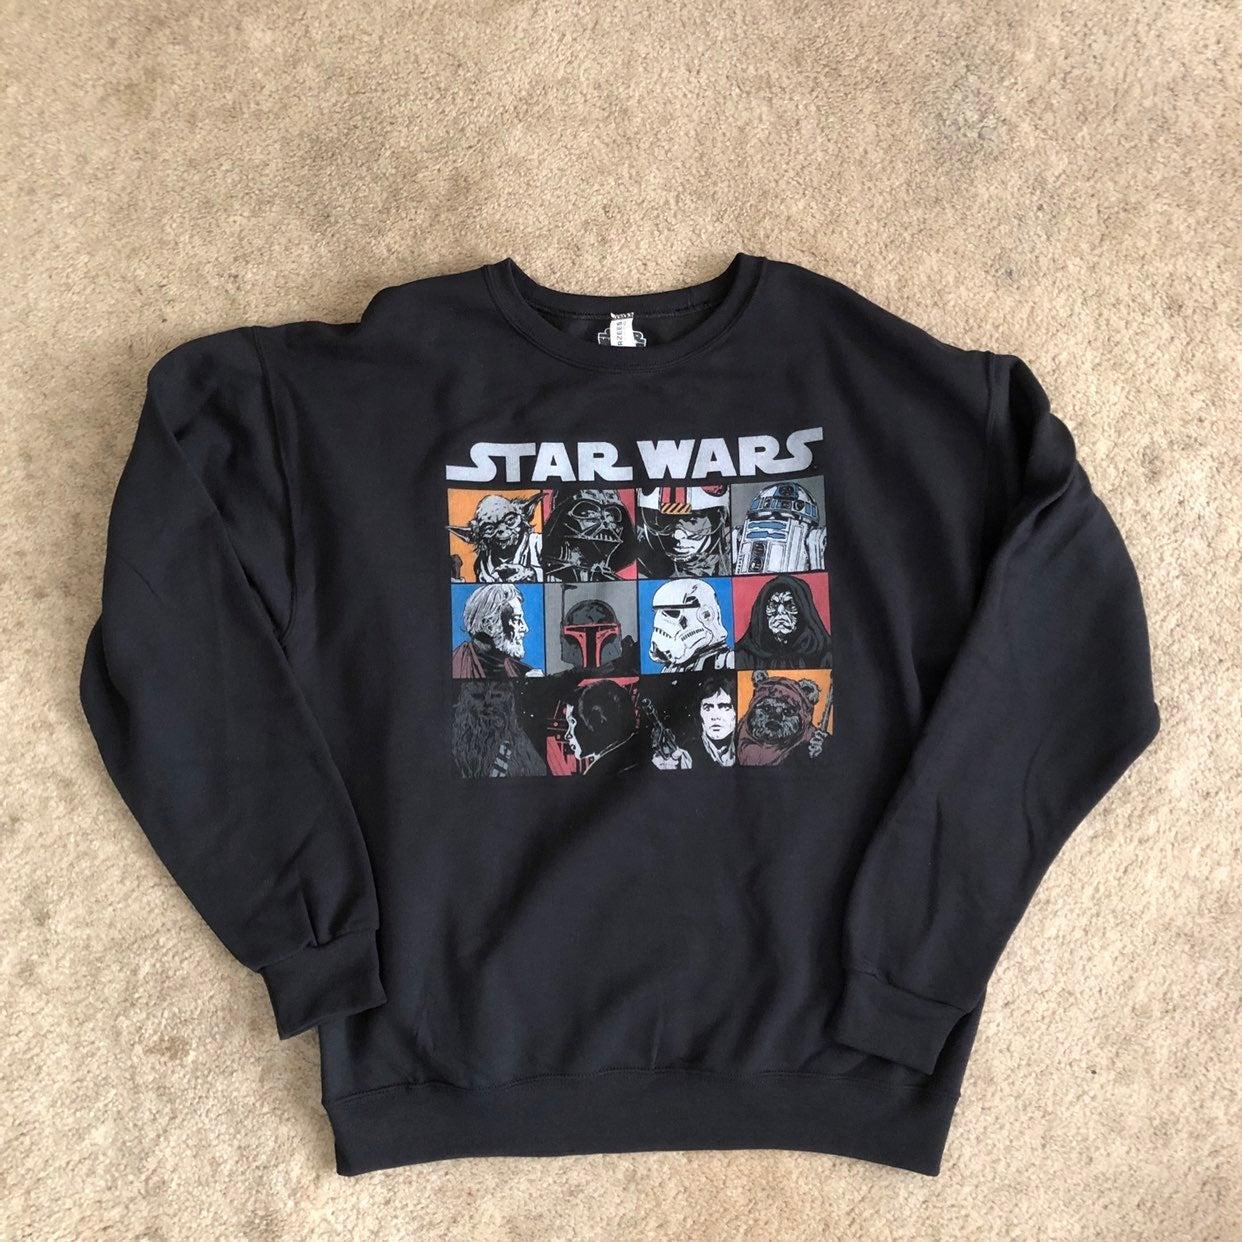 Star Wars Mens Sweatshirt Black